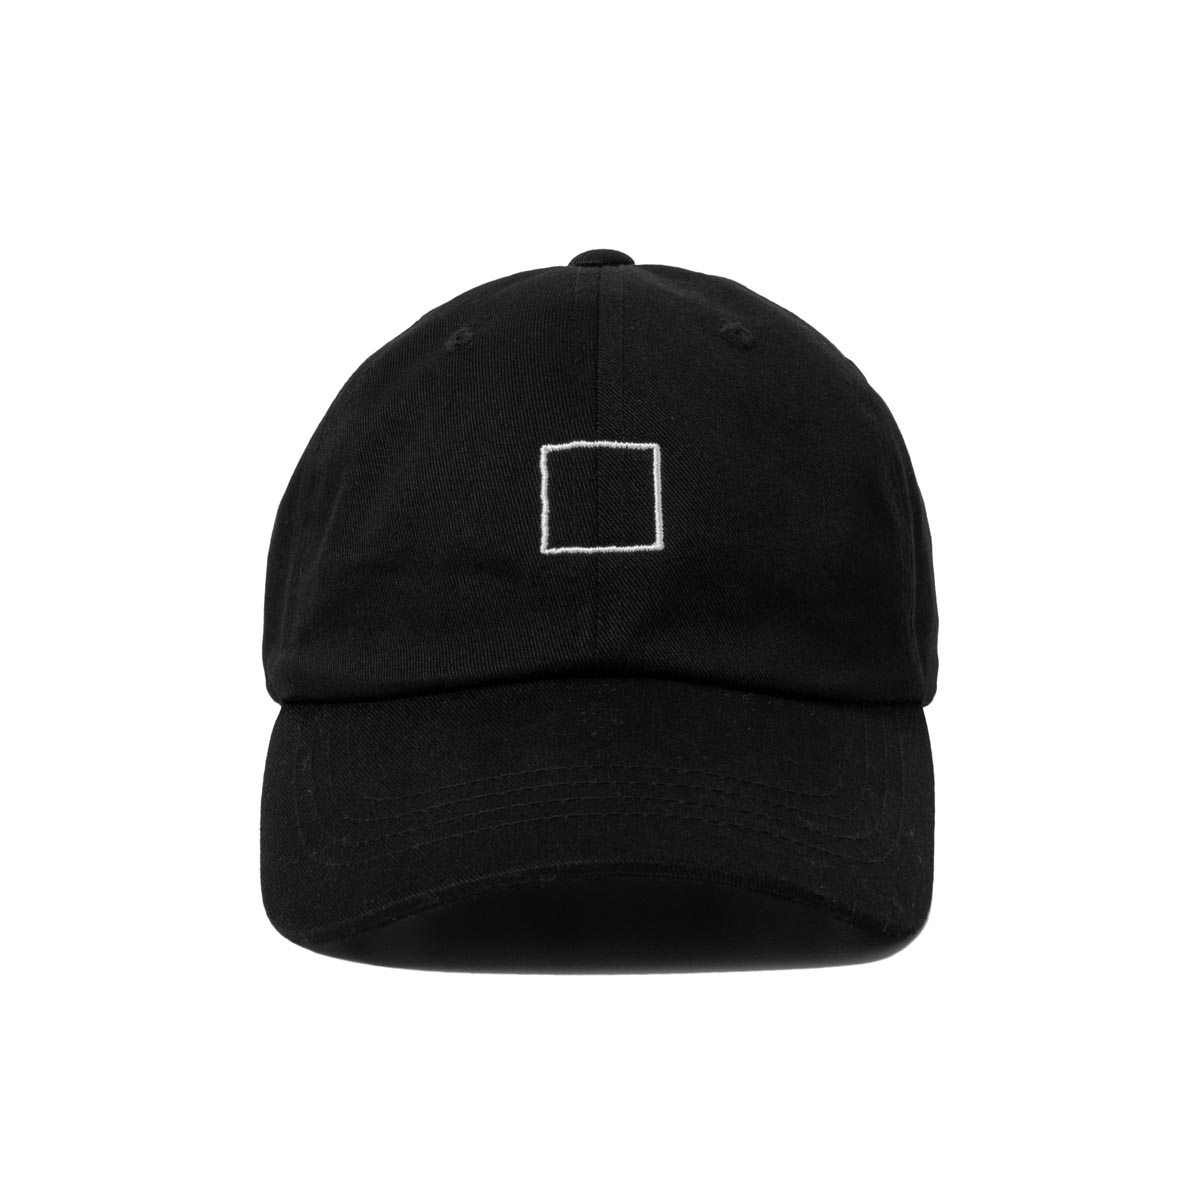 IDONTMIND-Outline-Hat.jpg